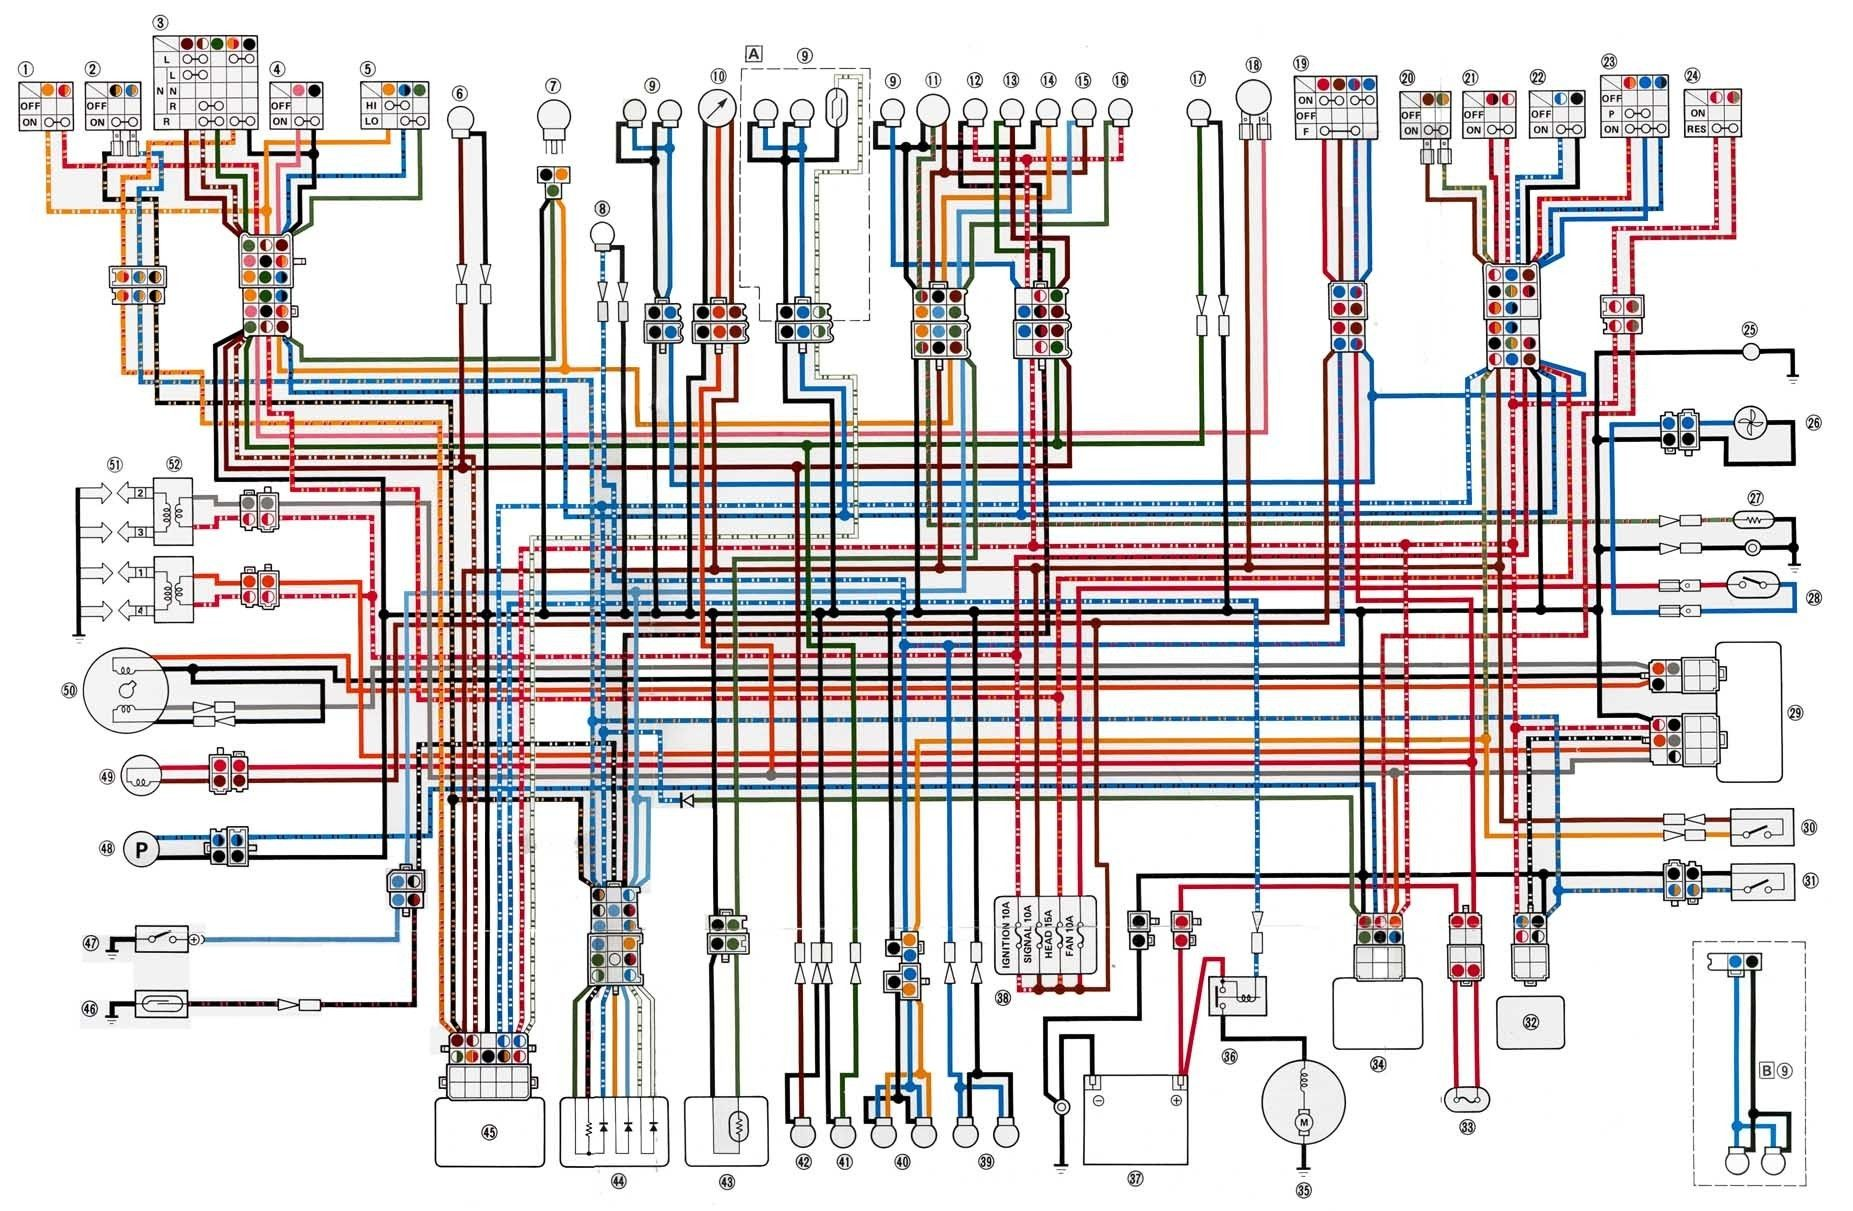 Awesome Wiring Diagram Xj 600 Diagrams Digramssample Diagramimages Wiringdiagramsample Wiringdiagram Schema